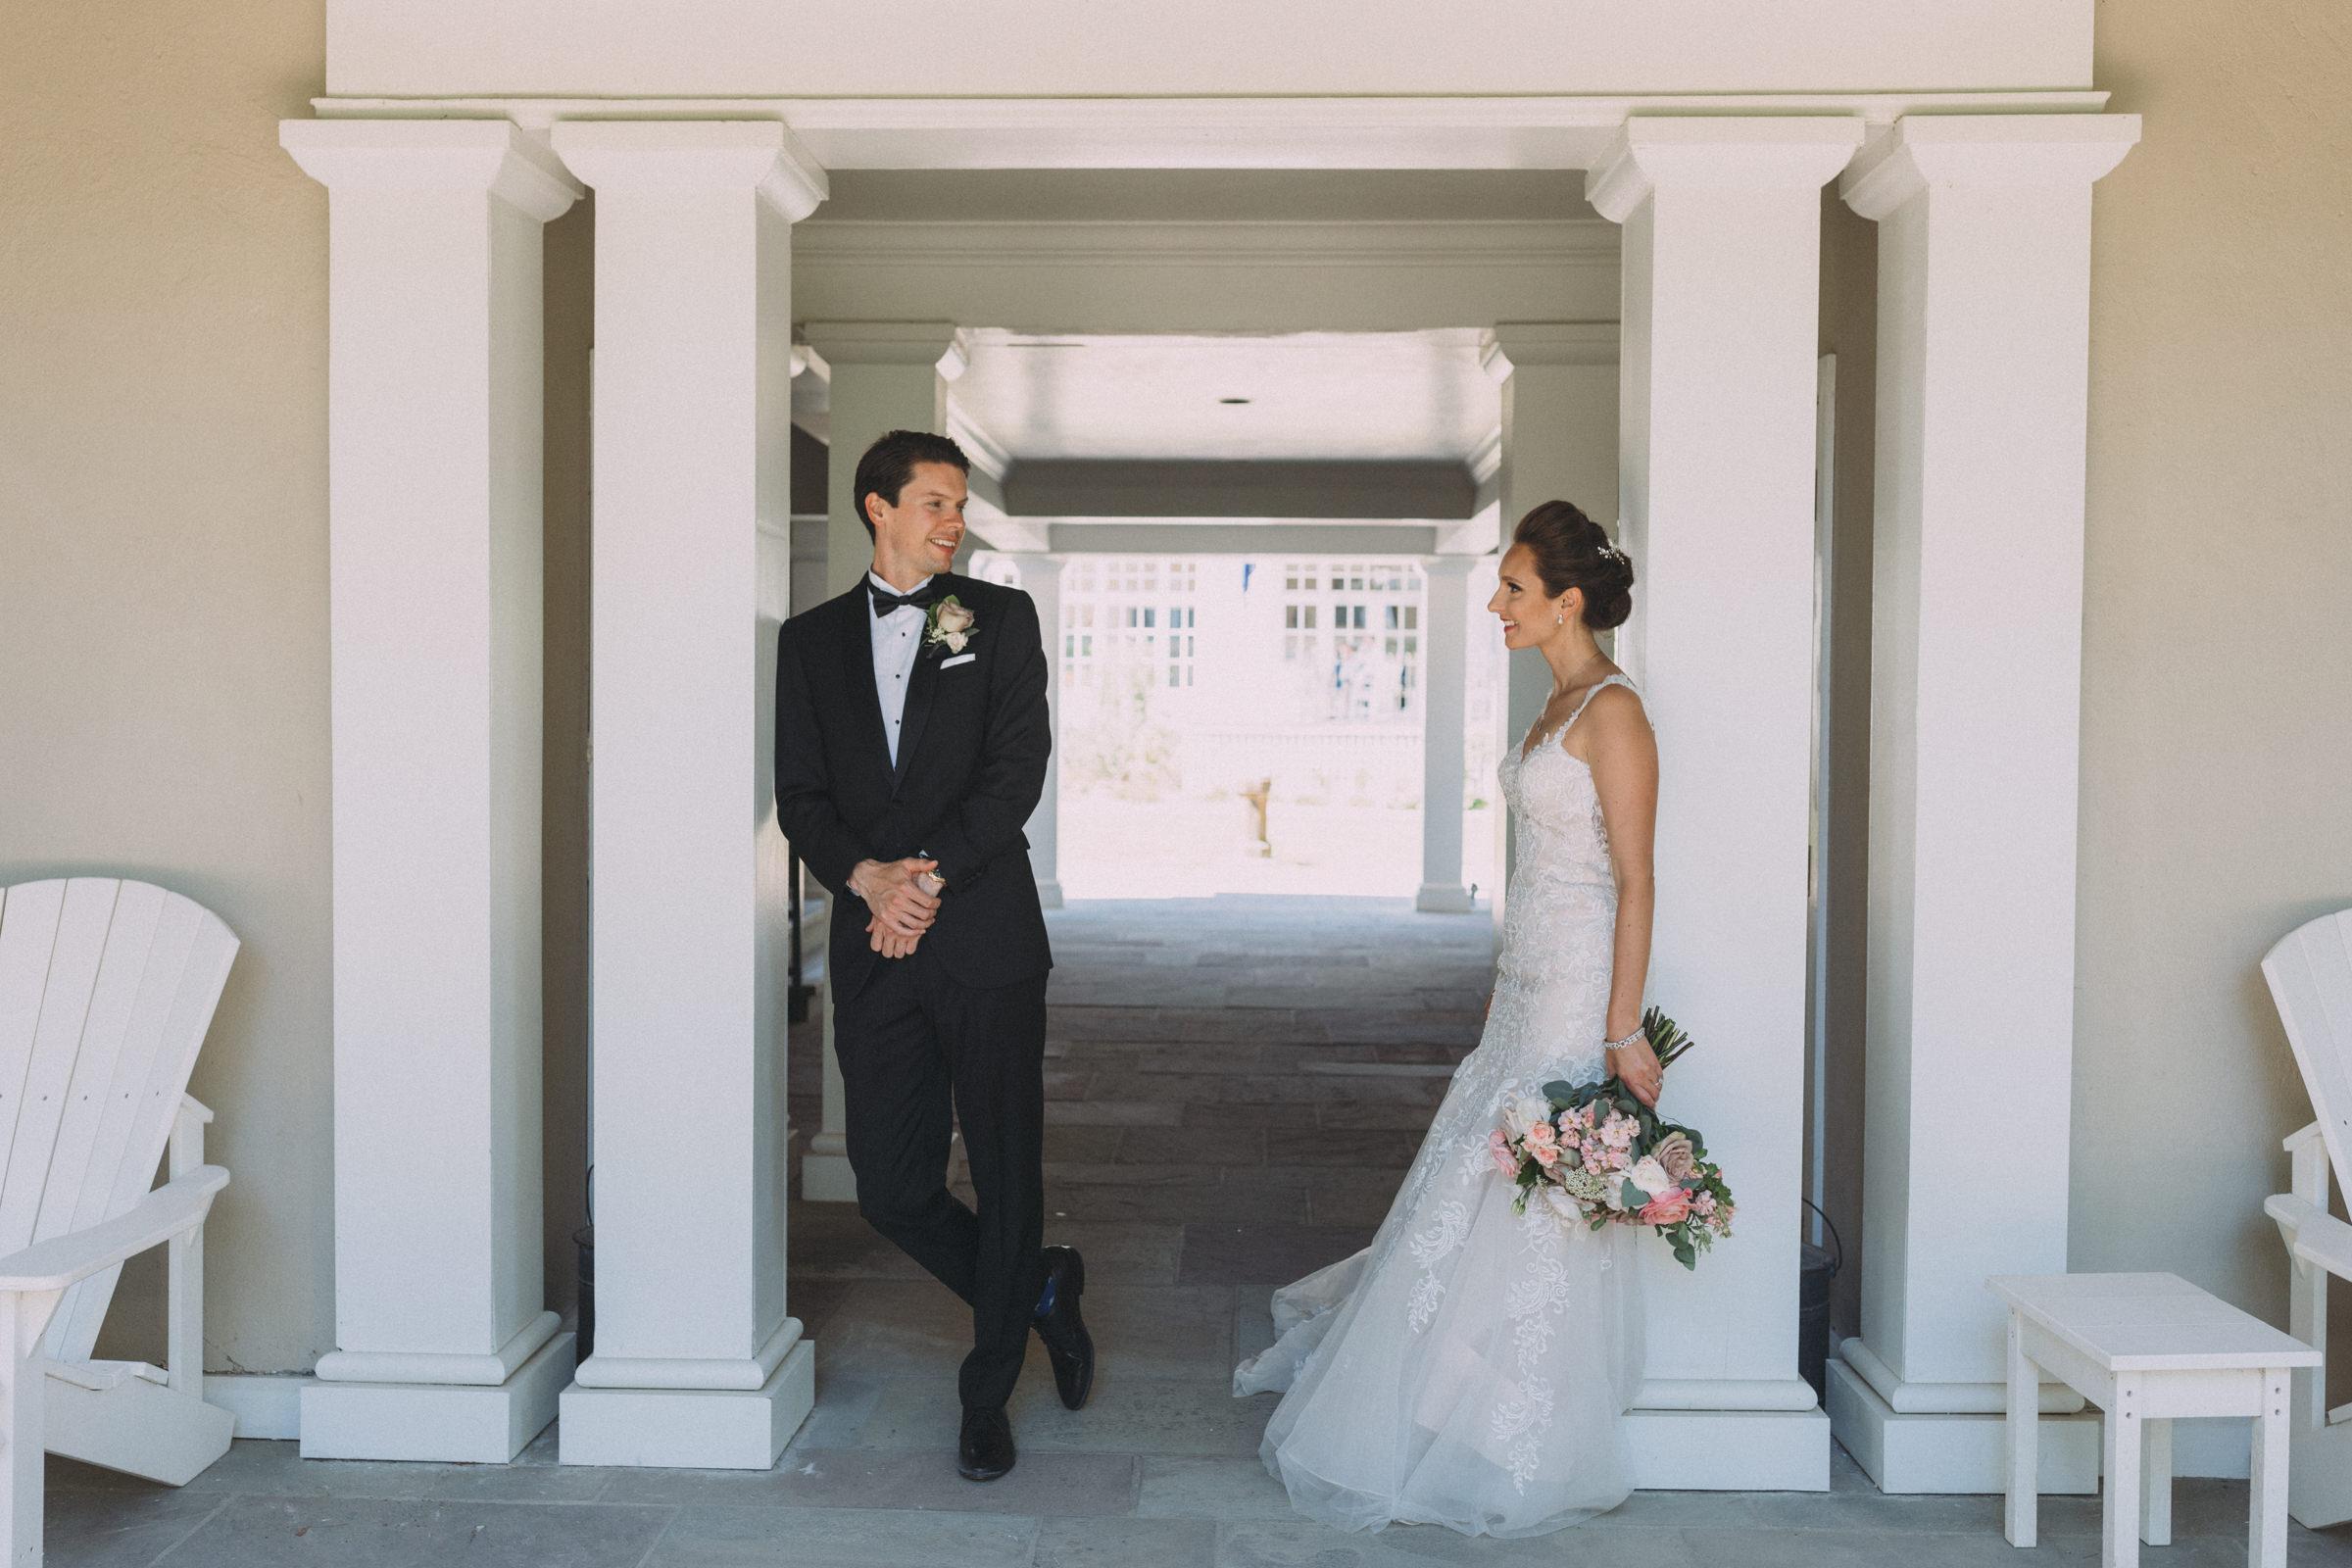 Langdon-Hall-wedding-photography-Cambridge-by-Sam-Wong-of-Visual-Cravings_Sarah-Ryan_21.jpg